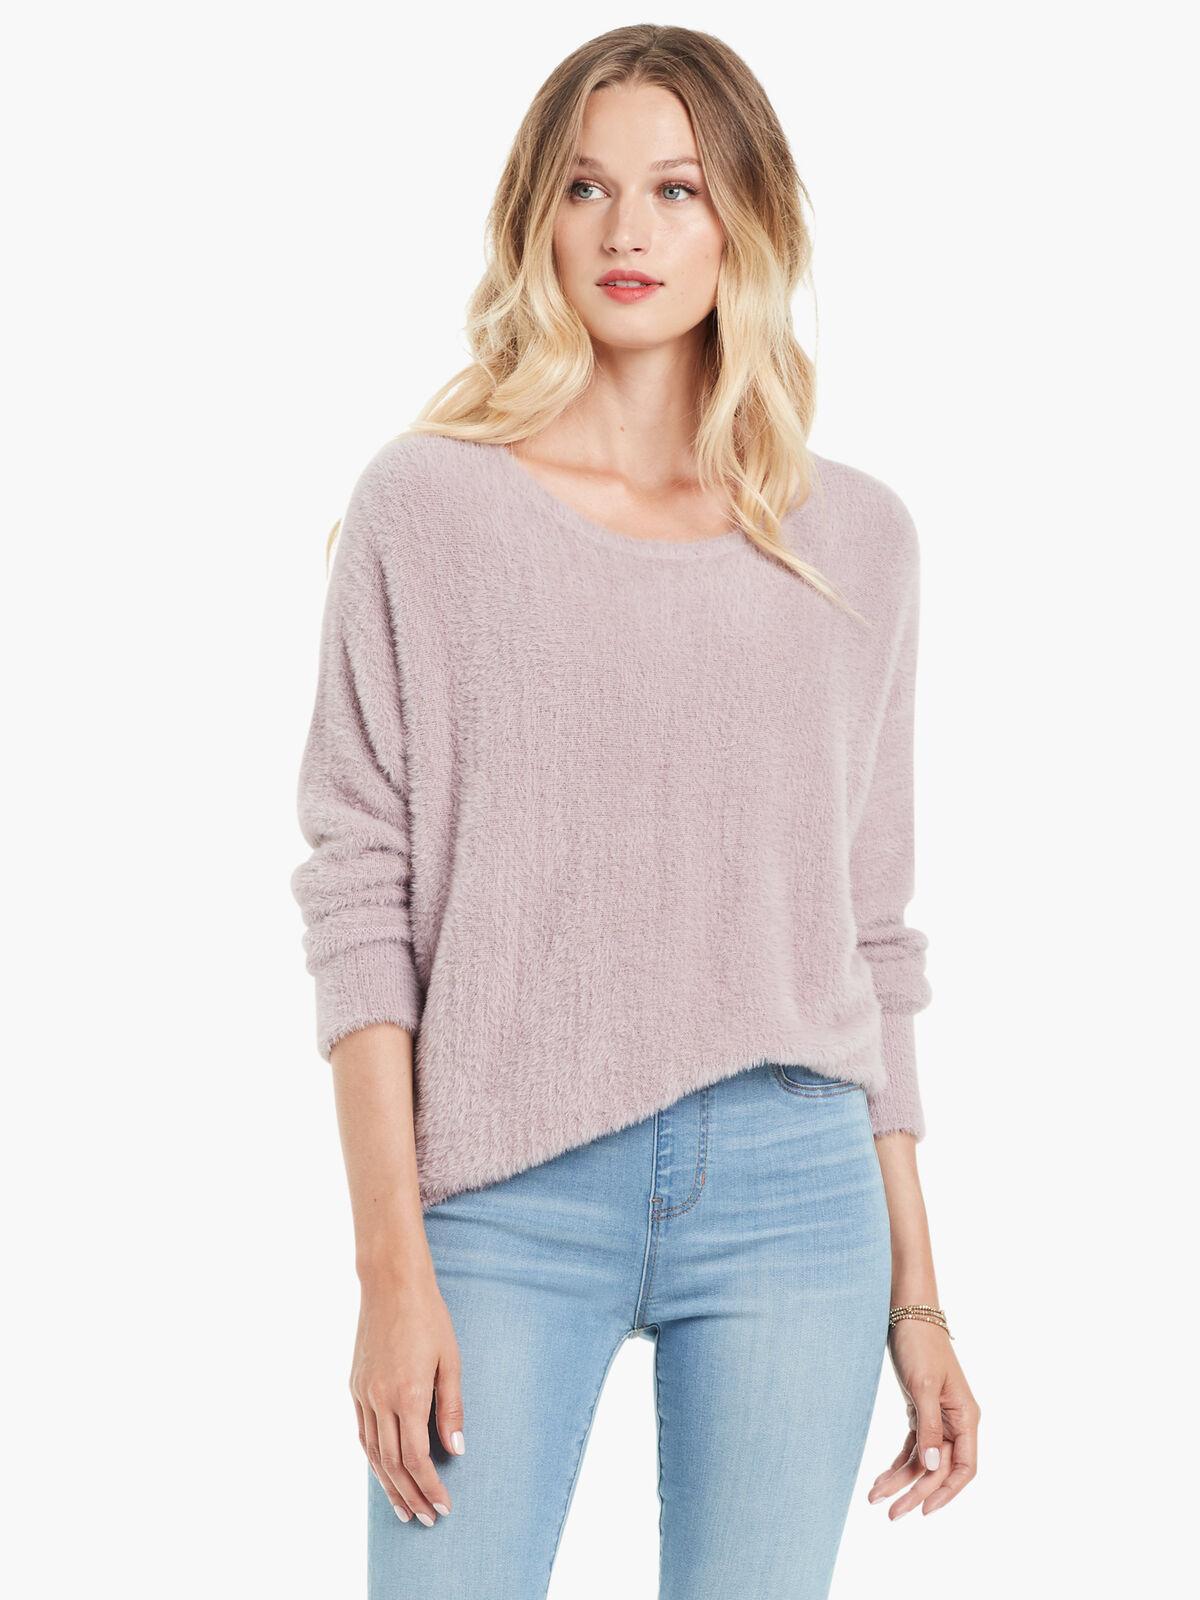 It's A Fluff Sweater